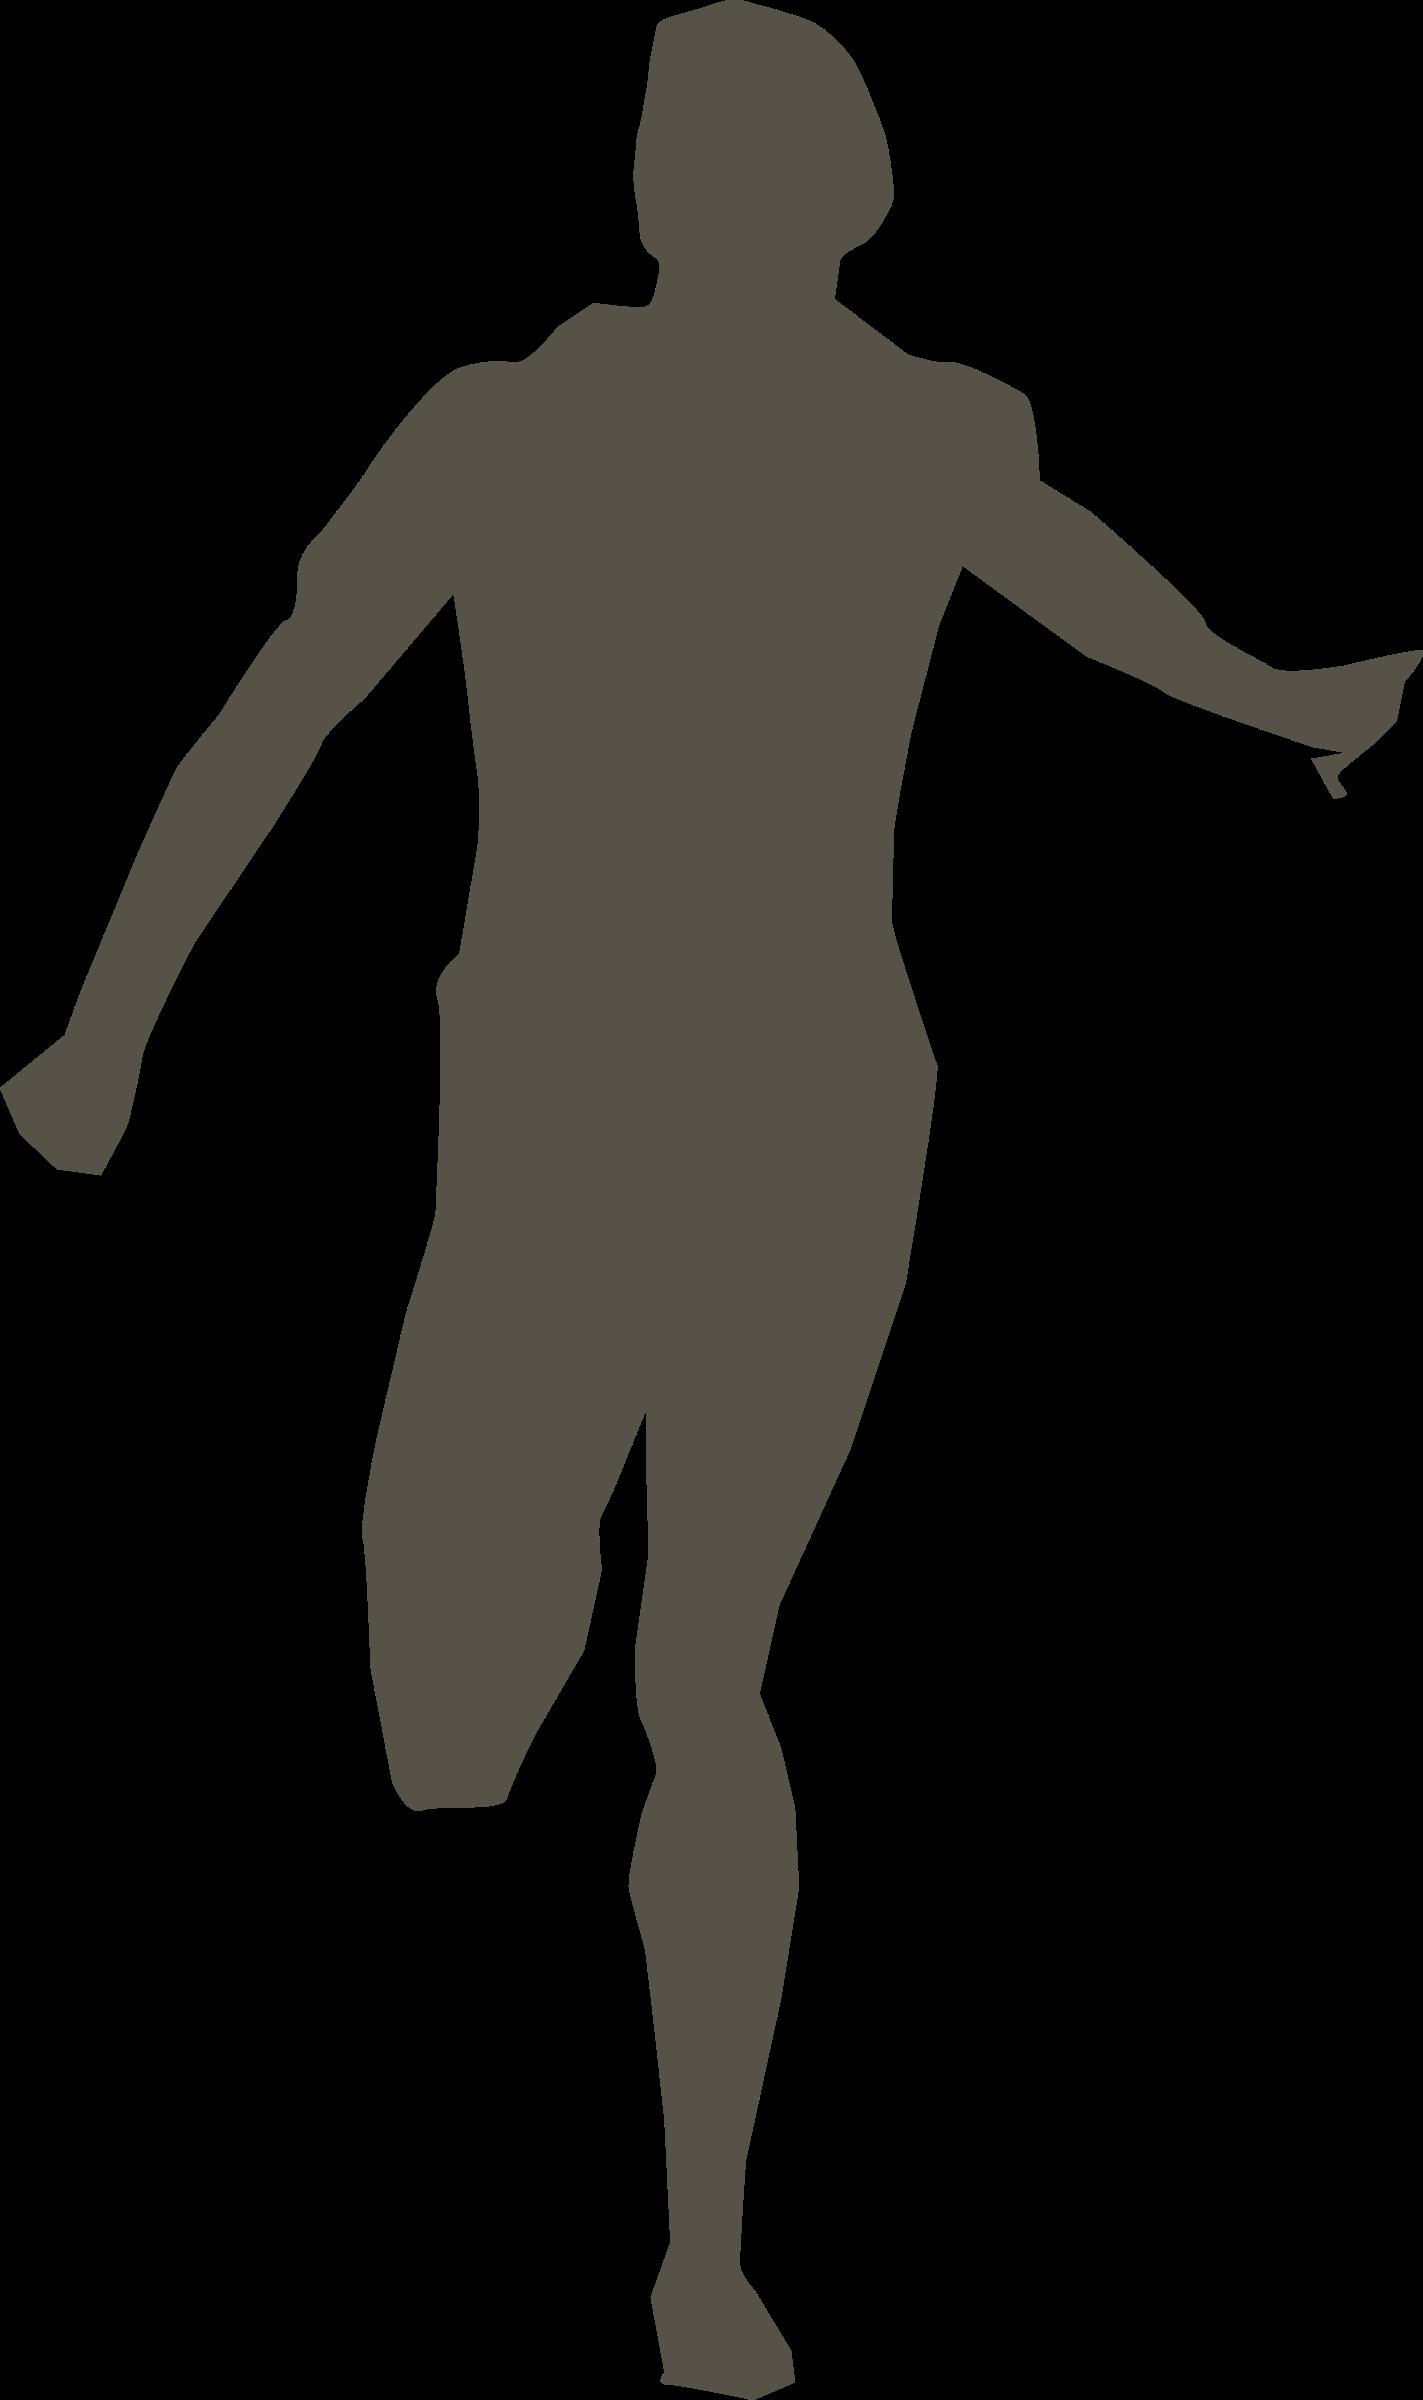 Runner big image png. Football clipart shadow